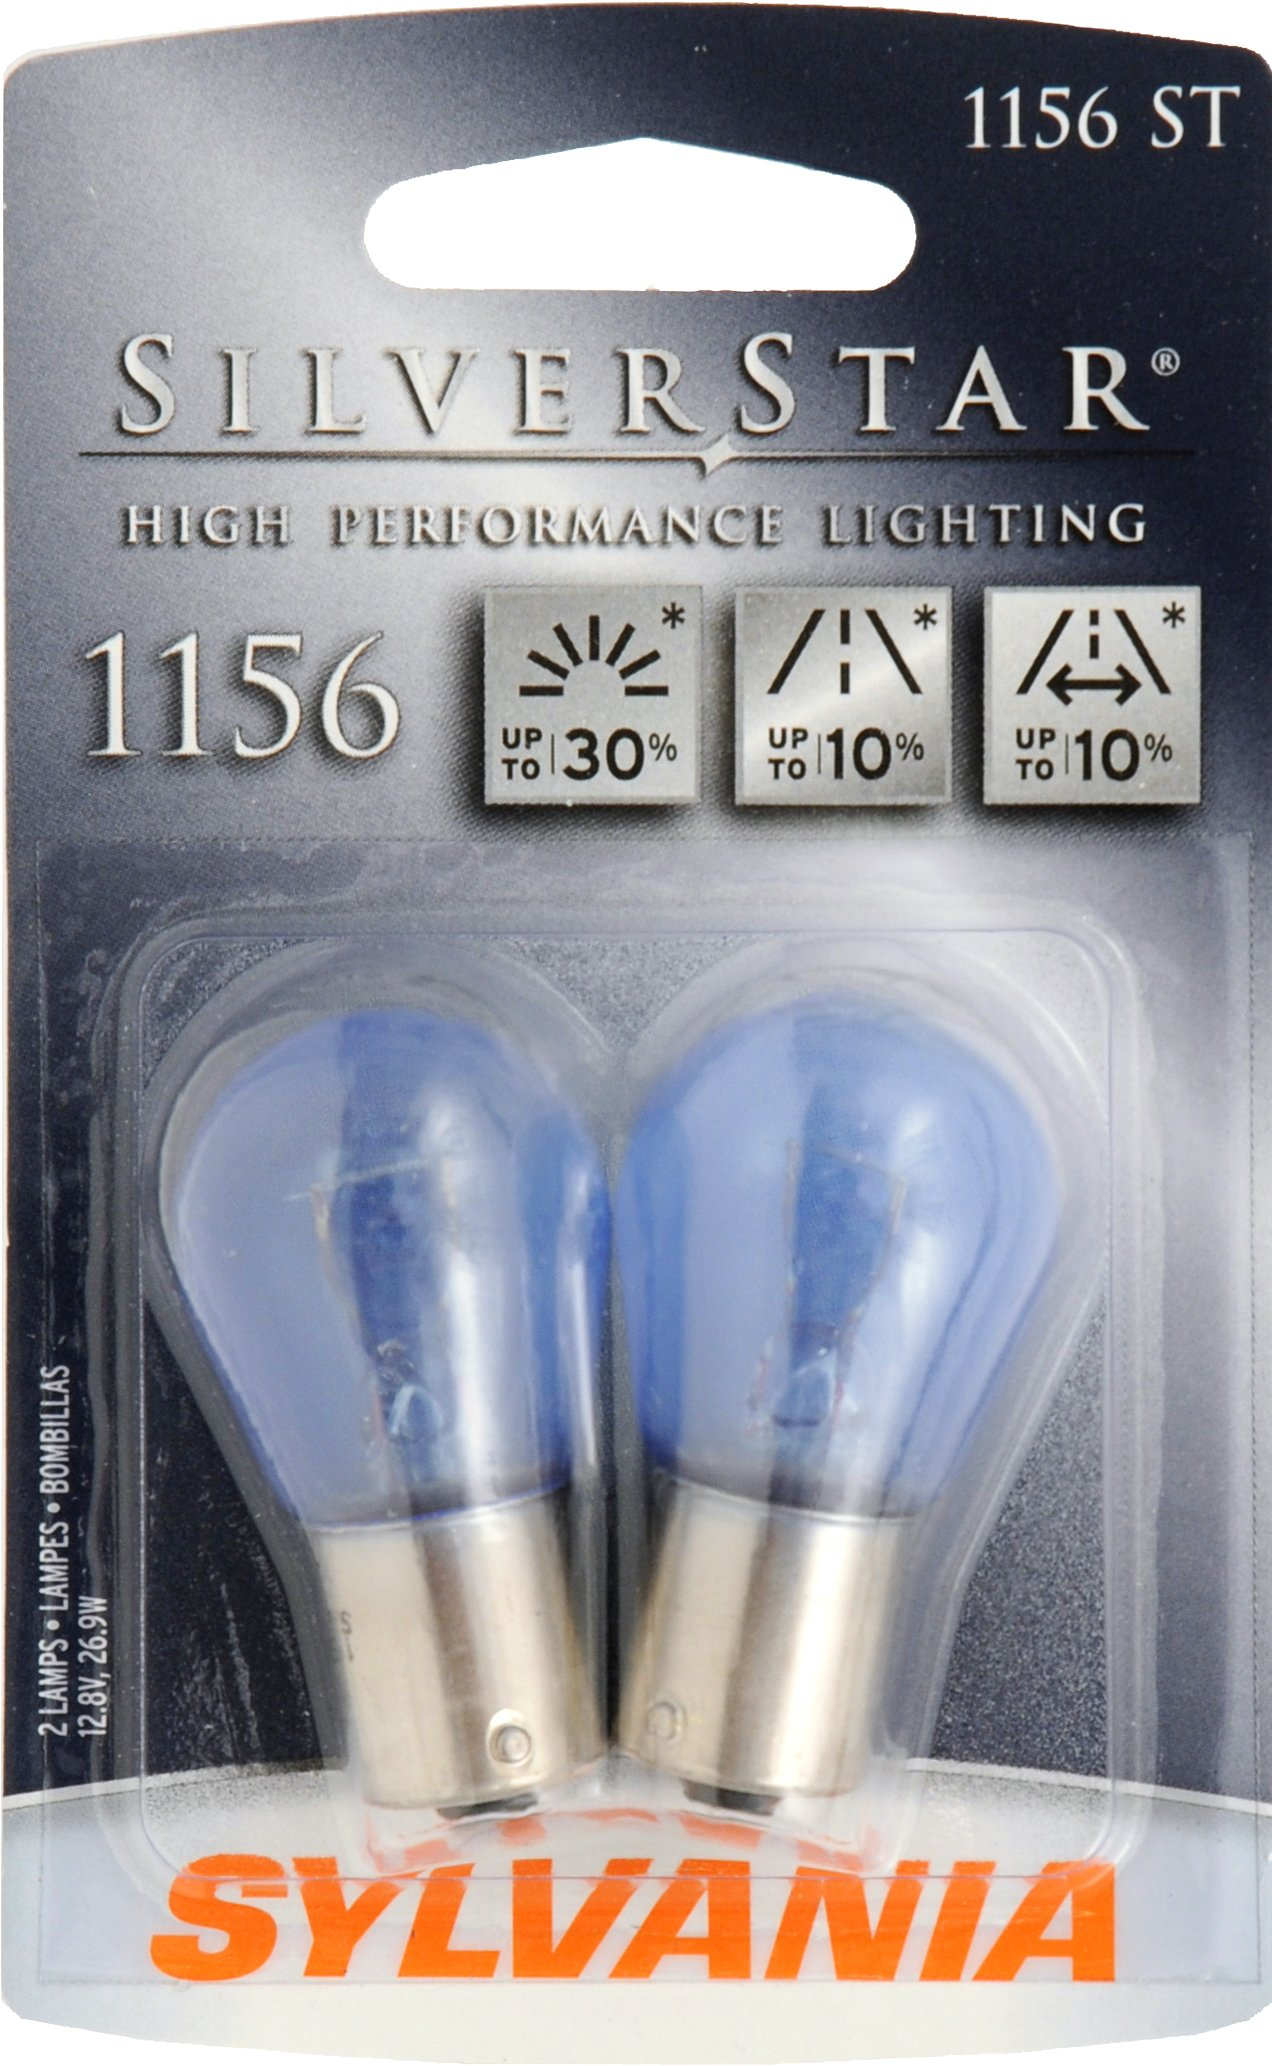 Sylvania 1156 ST SilverStar High Performance Halogen Miniature Lamp, (Pack of 2)